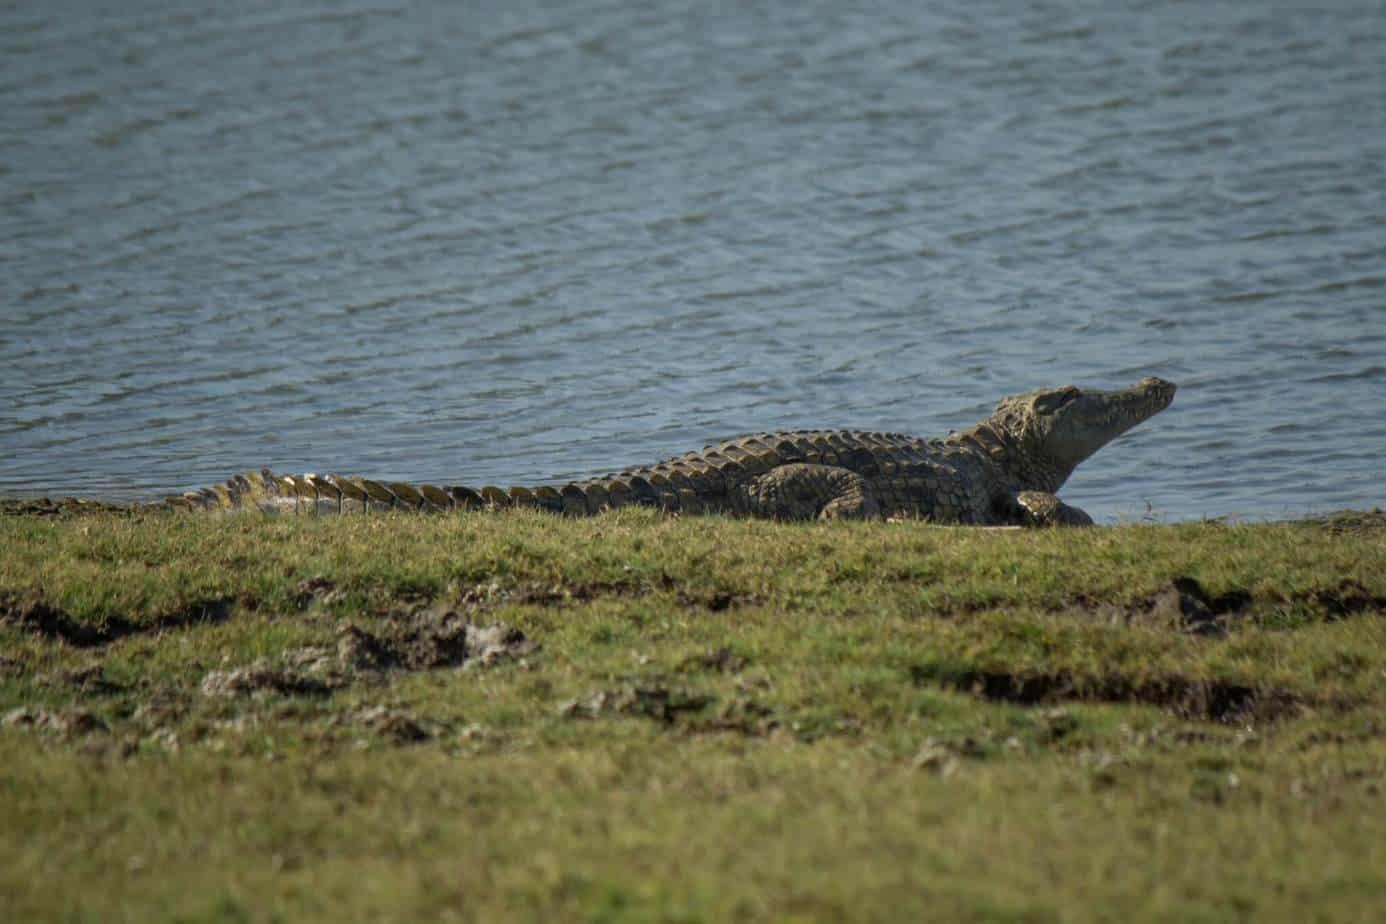 Nile Crocodile6